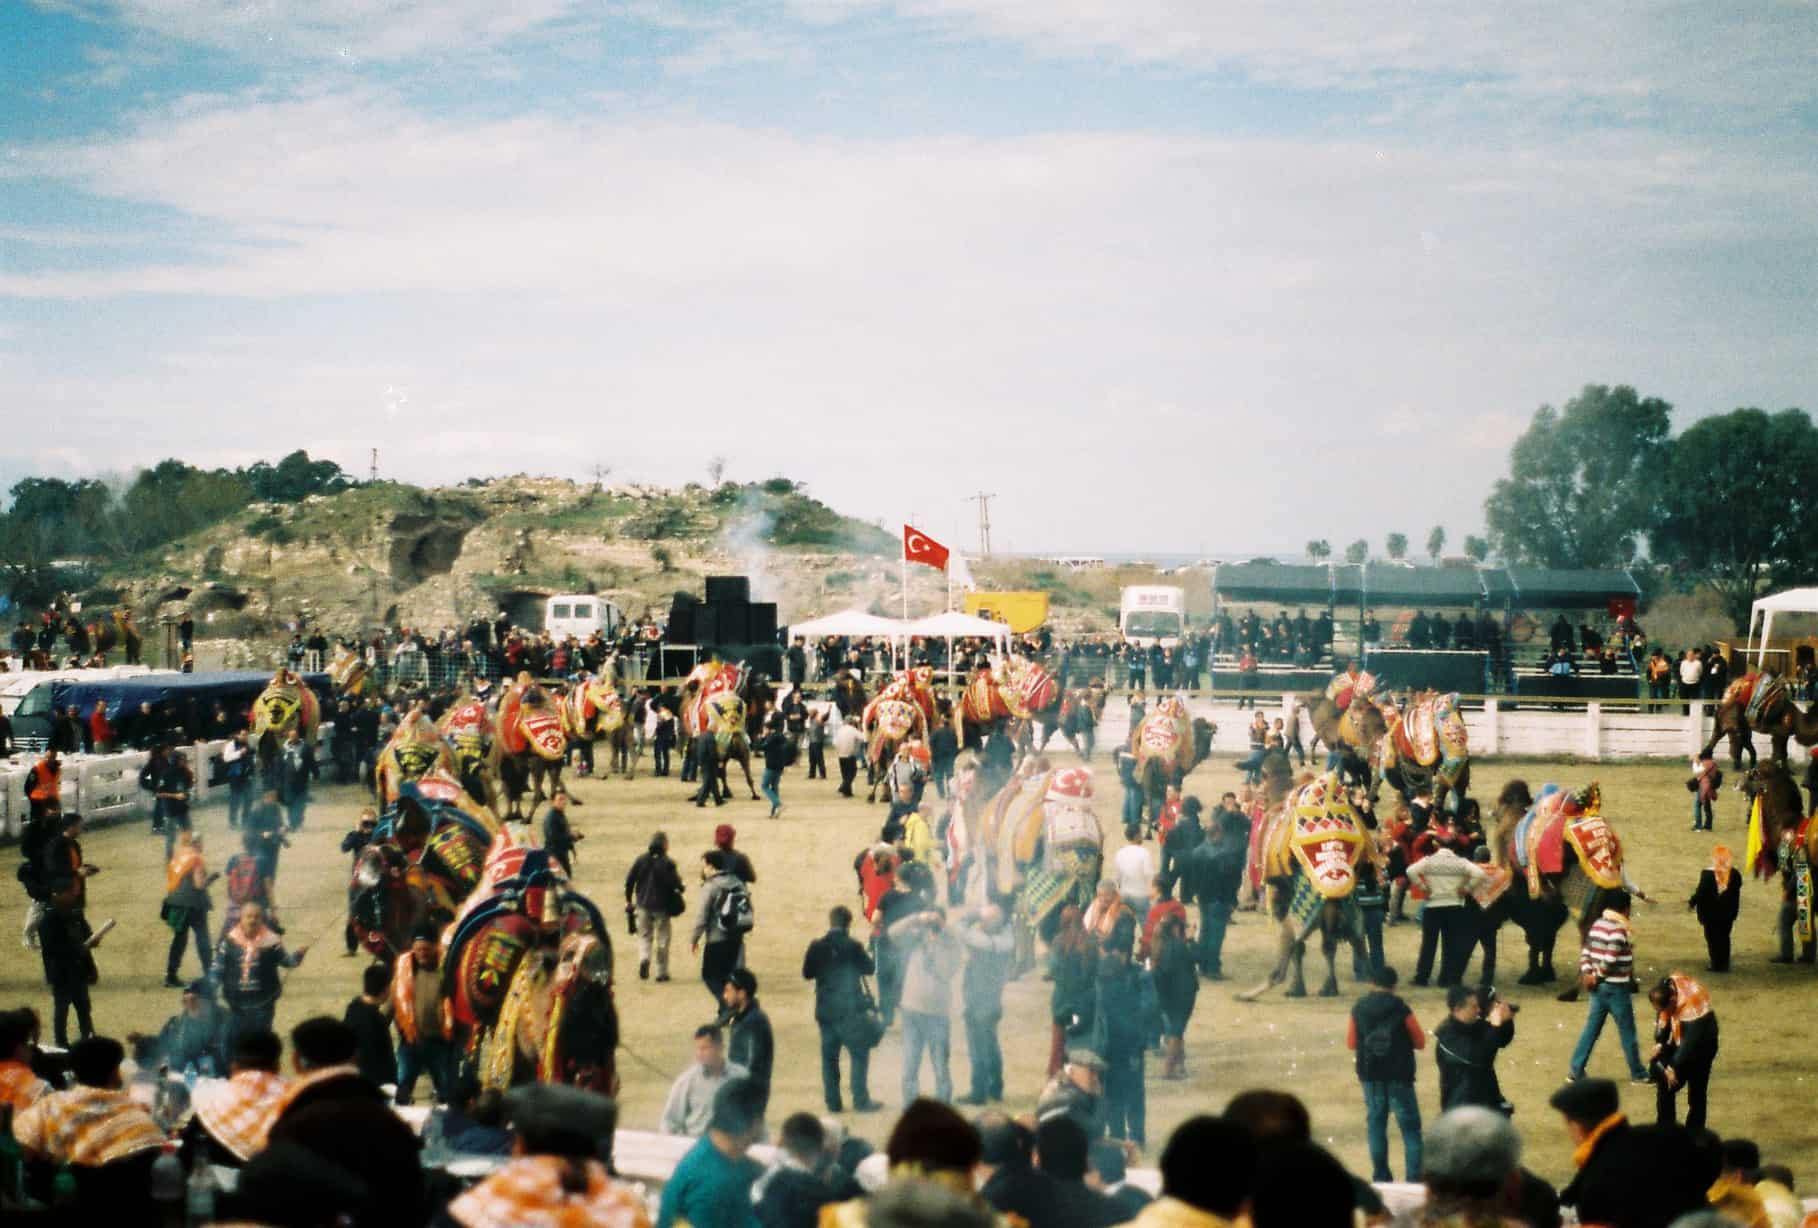 Crowded Camel Pitch (camel wrestling festival)